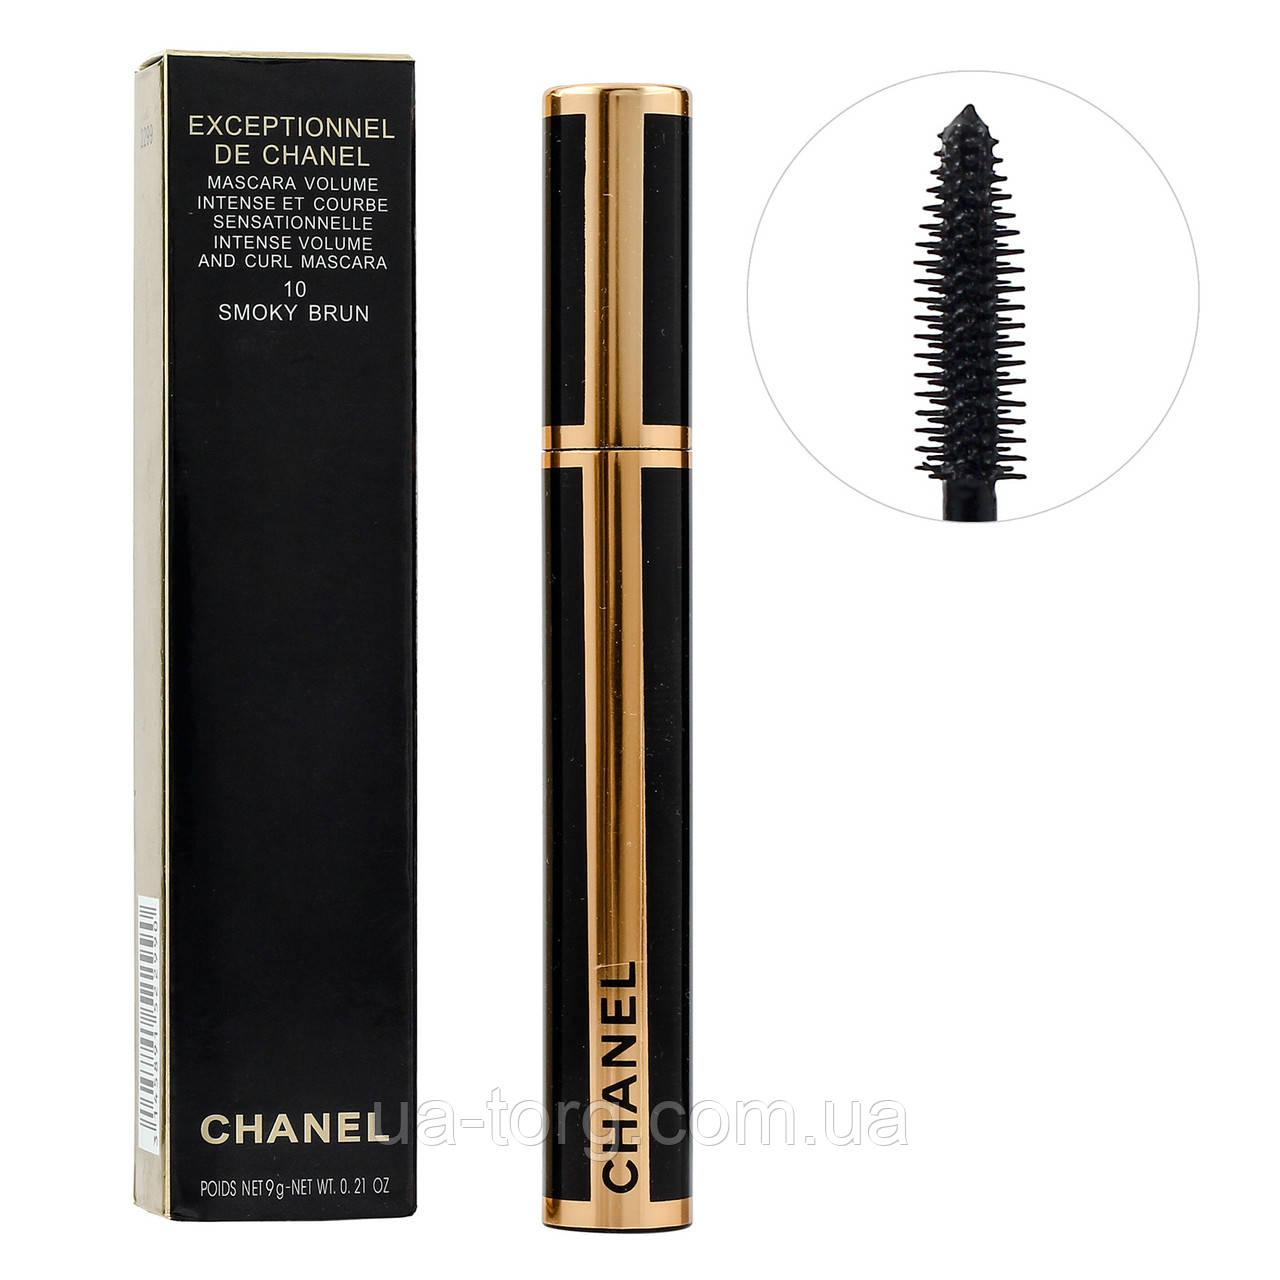 Тушь для ресниц Chanel Exceptionnel De Chanel 10 Smoky Brun